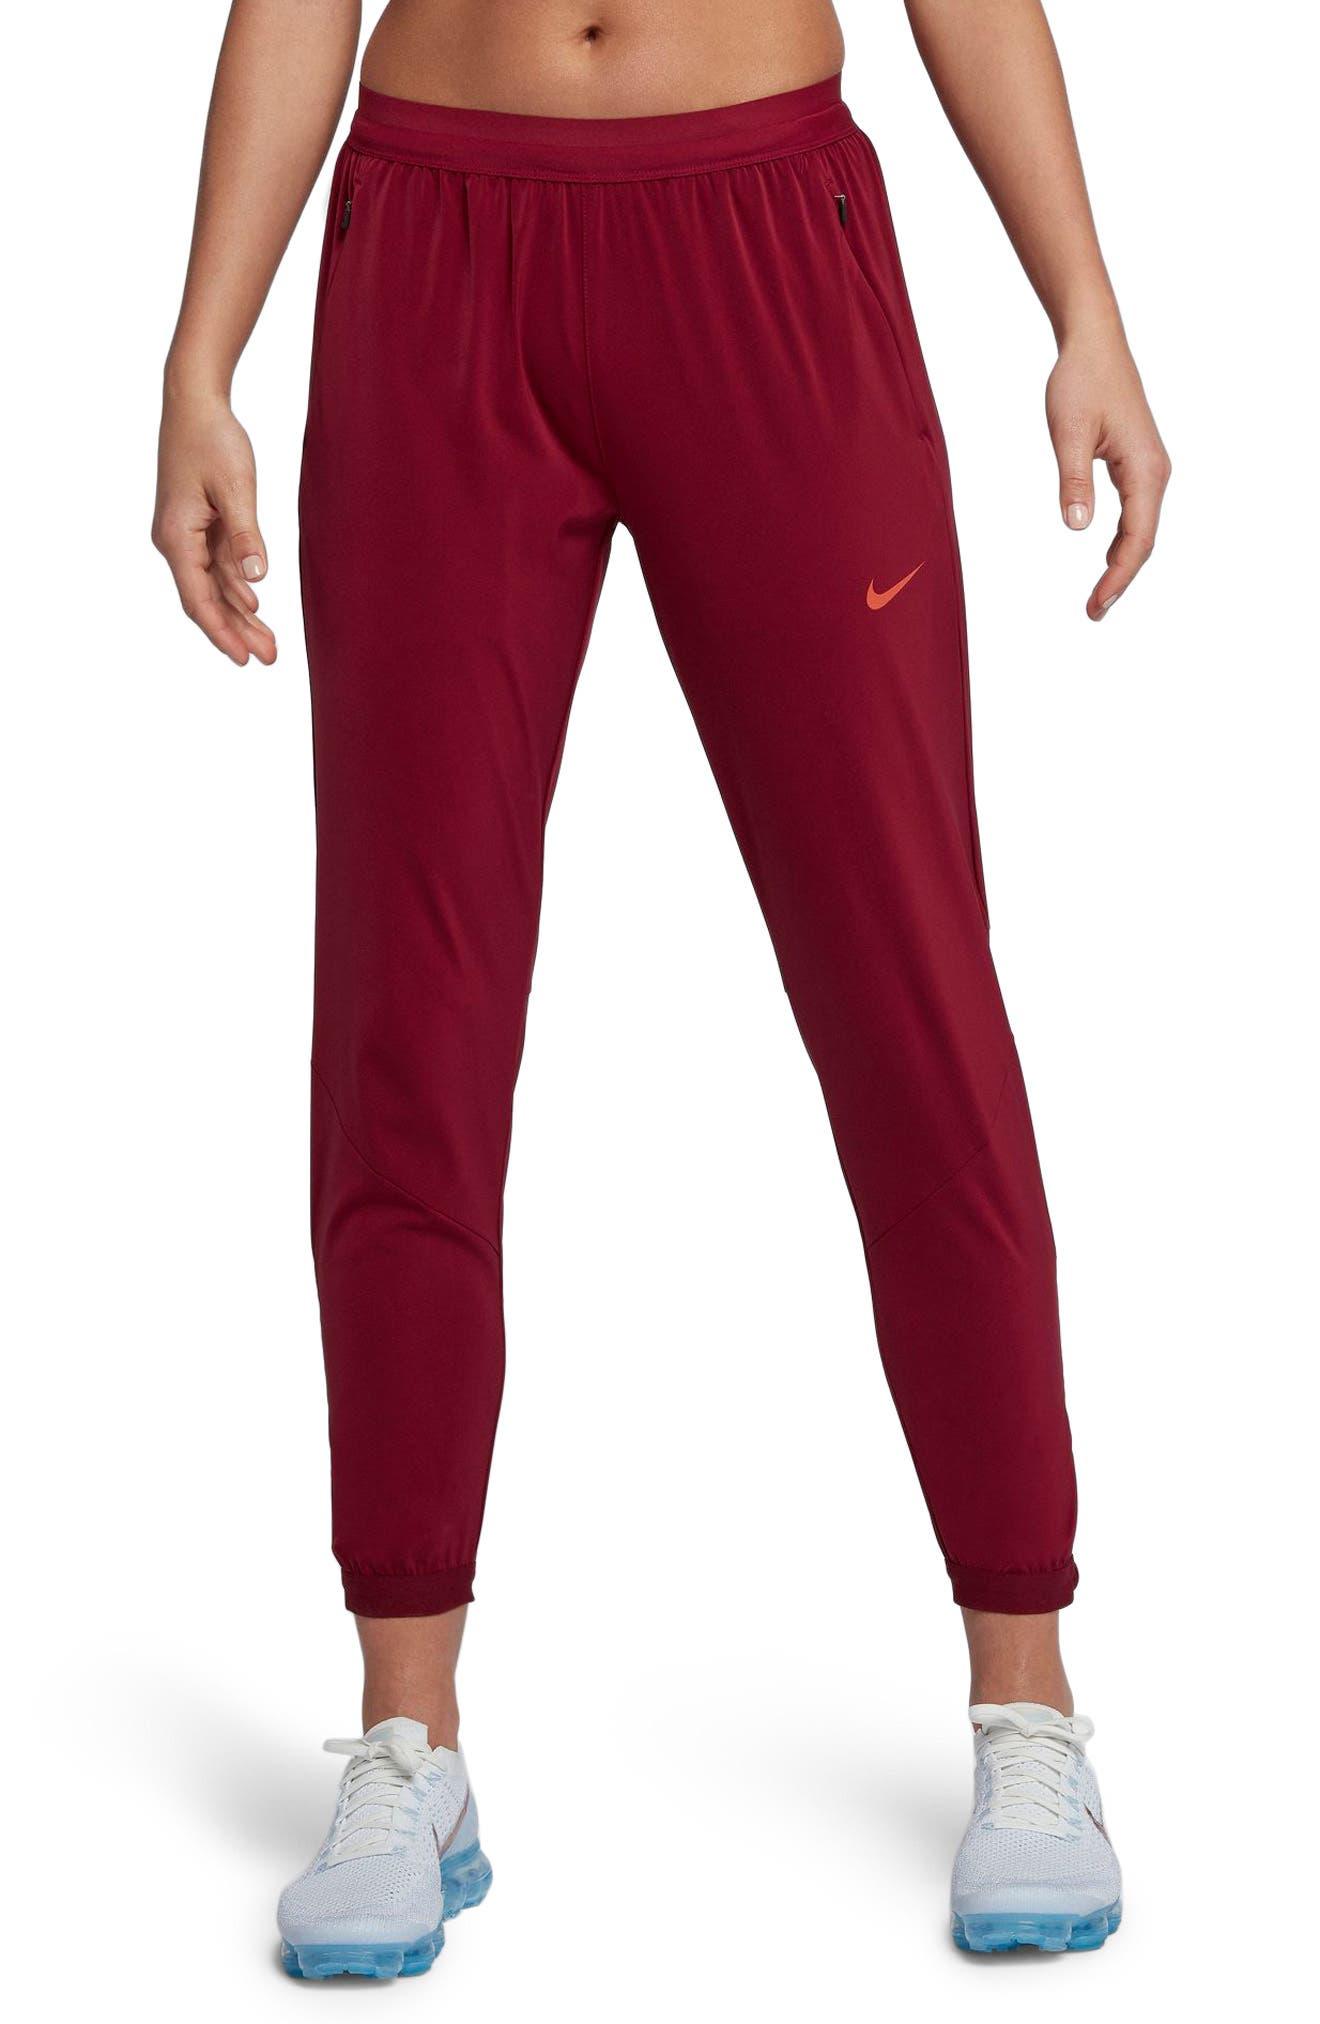 Women's Dry Running Stadium Pants,                         Main,                         color, 600